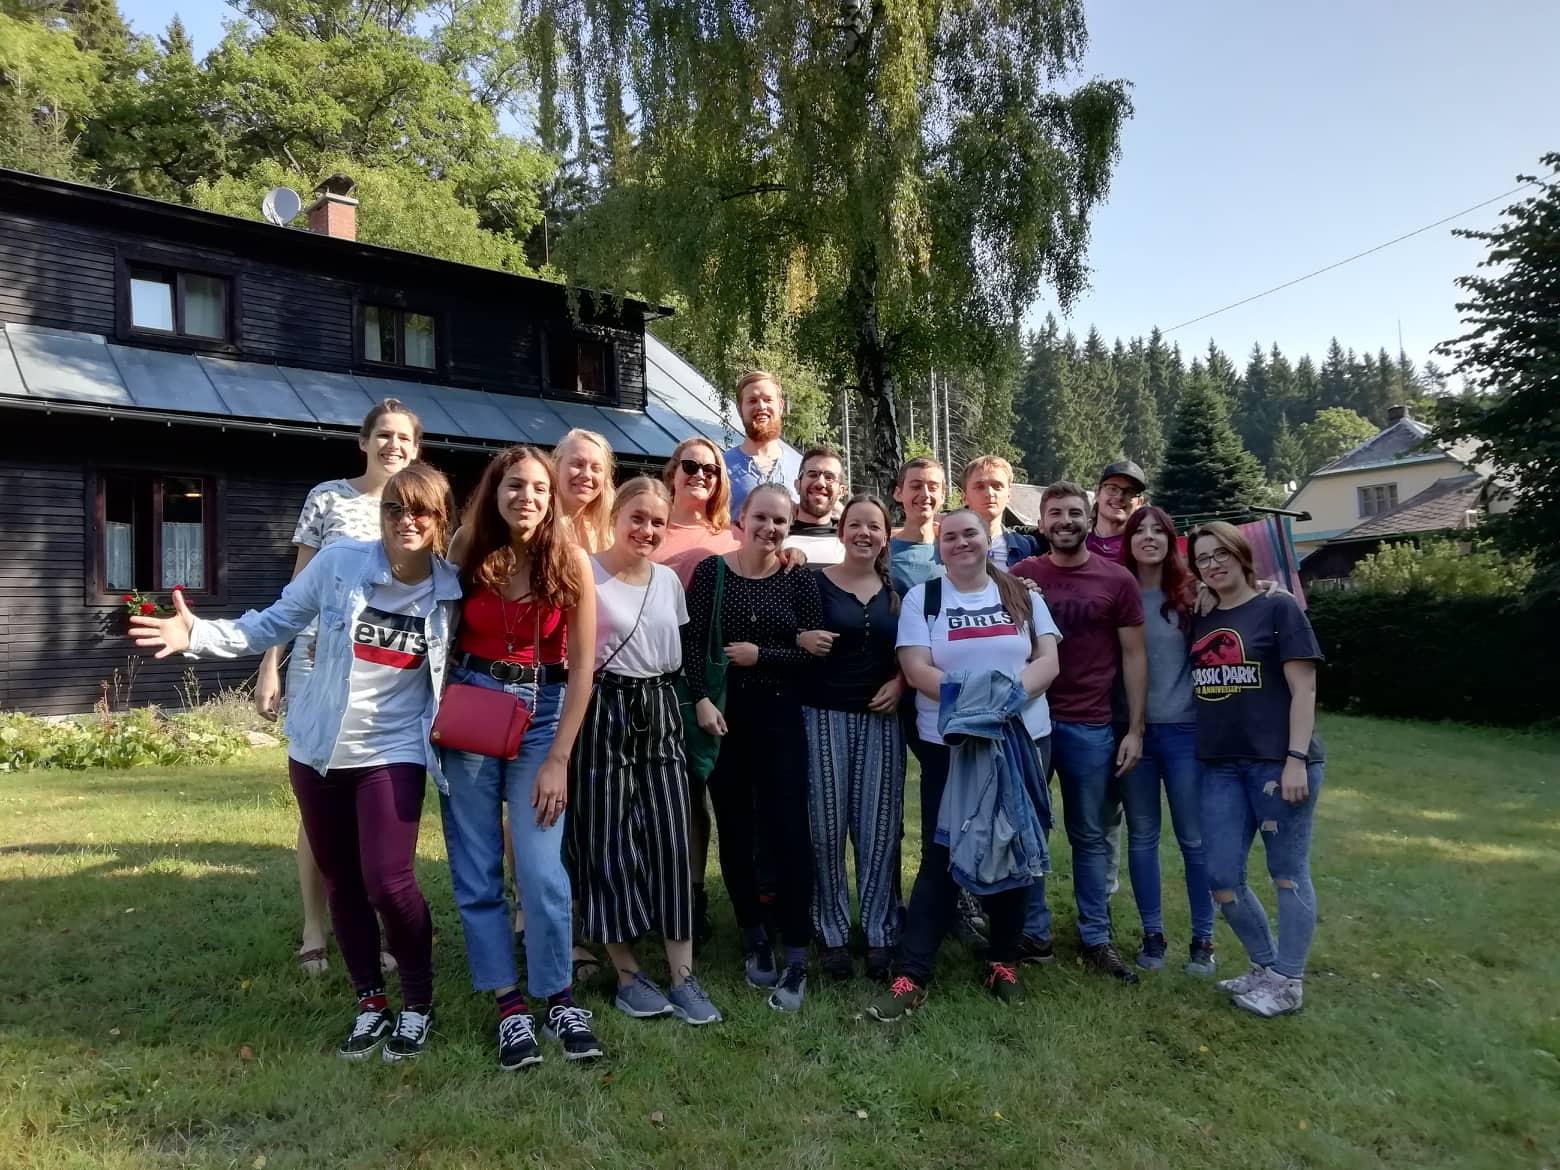 koolitus training course nyh czech tsehii estonia eesti trainers